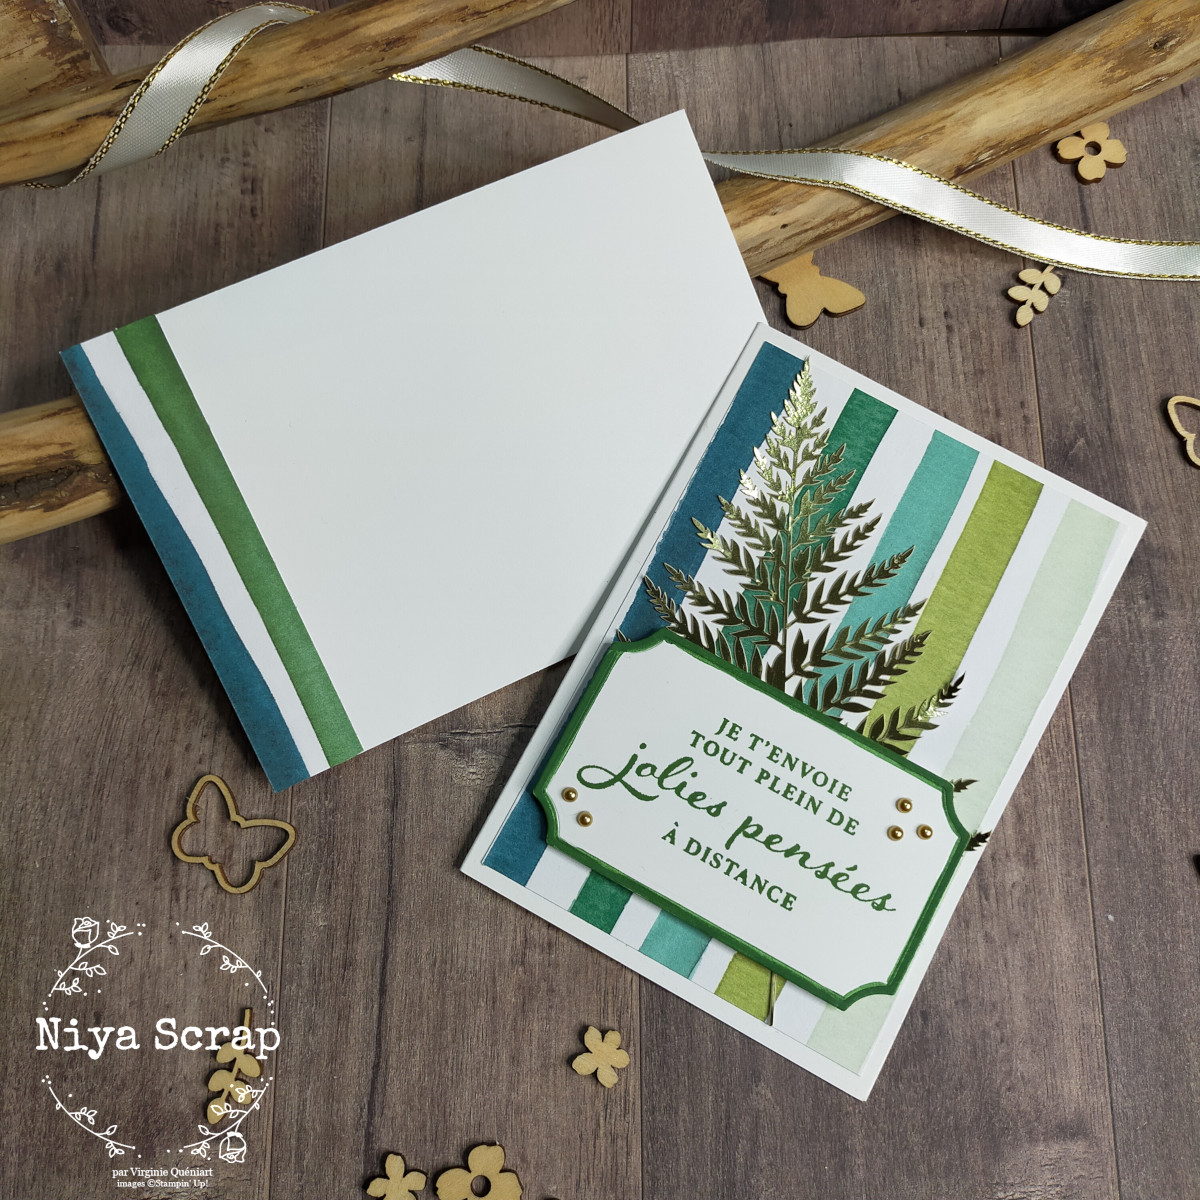 Niya Scrap - coffret végétal de 6 cartes - Matériel Stampin' Up!